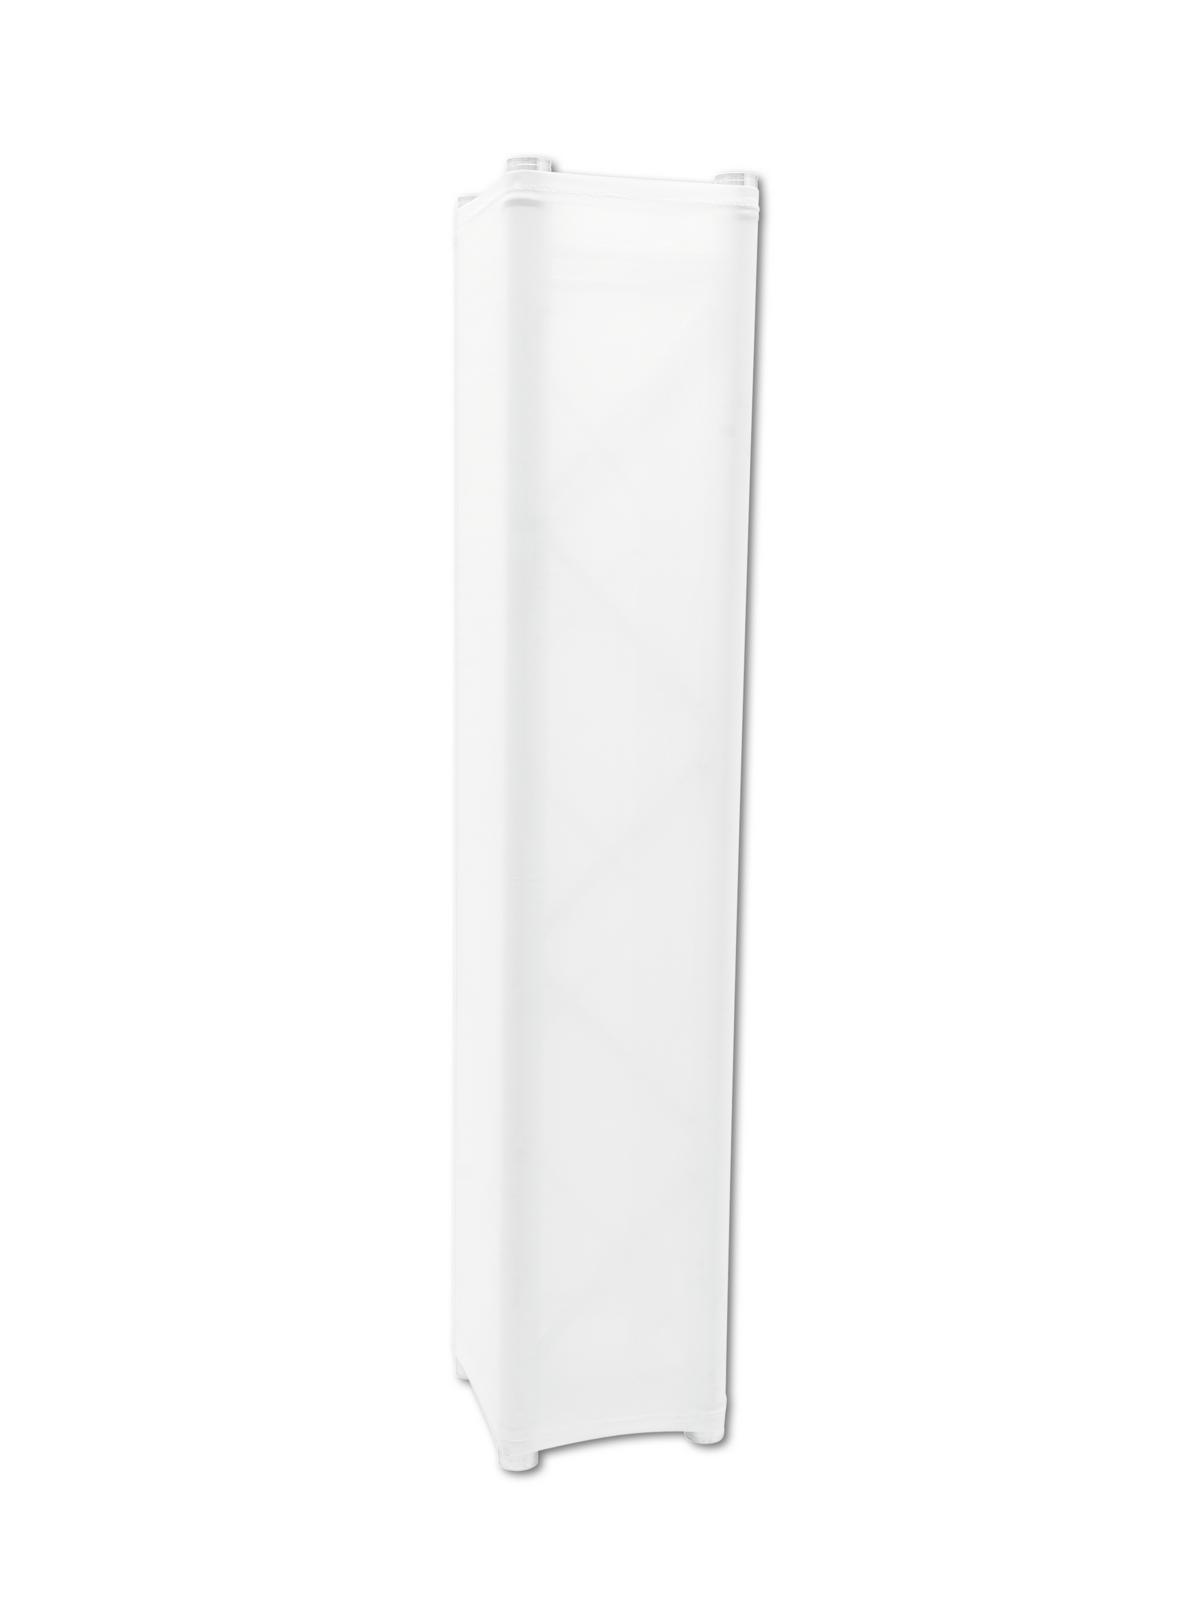 ESPANDERE XPTC20 Capriata di copertura di 200 cm bianco